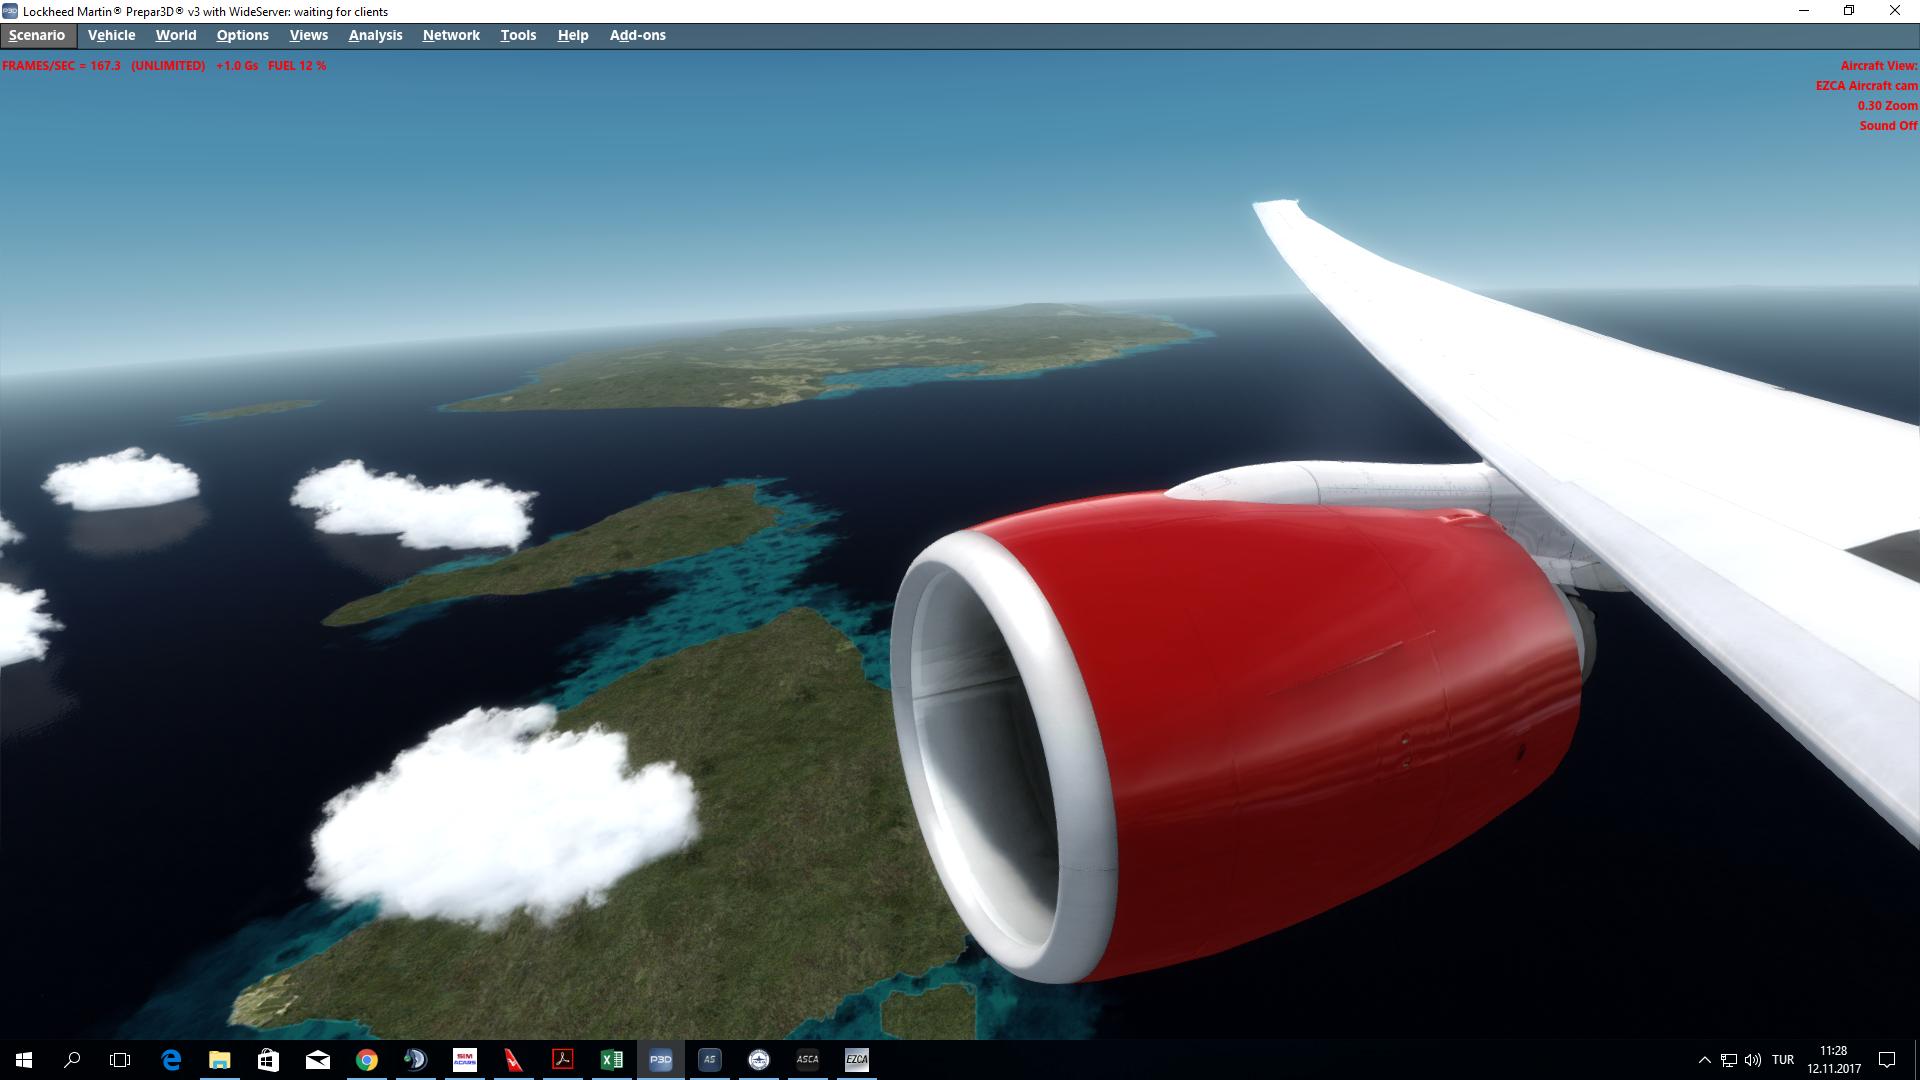 Desktop Screenshot 2017.11.12 - 11.28.36.32